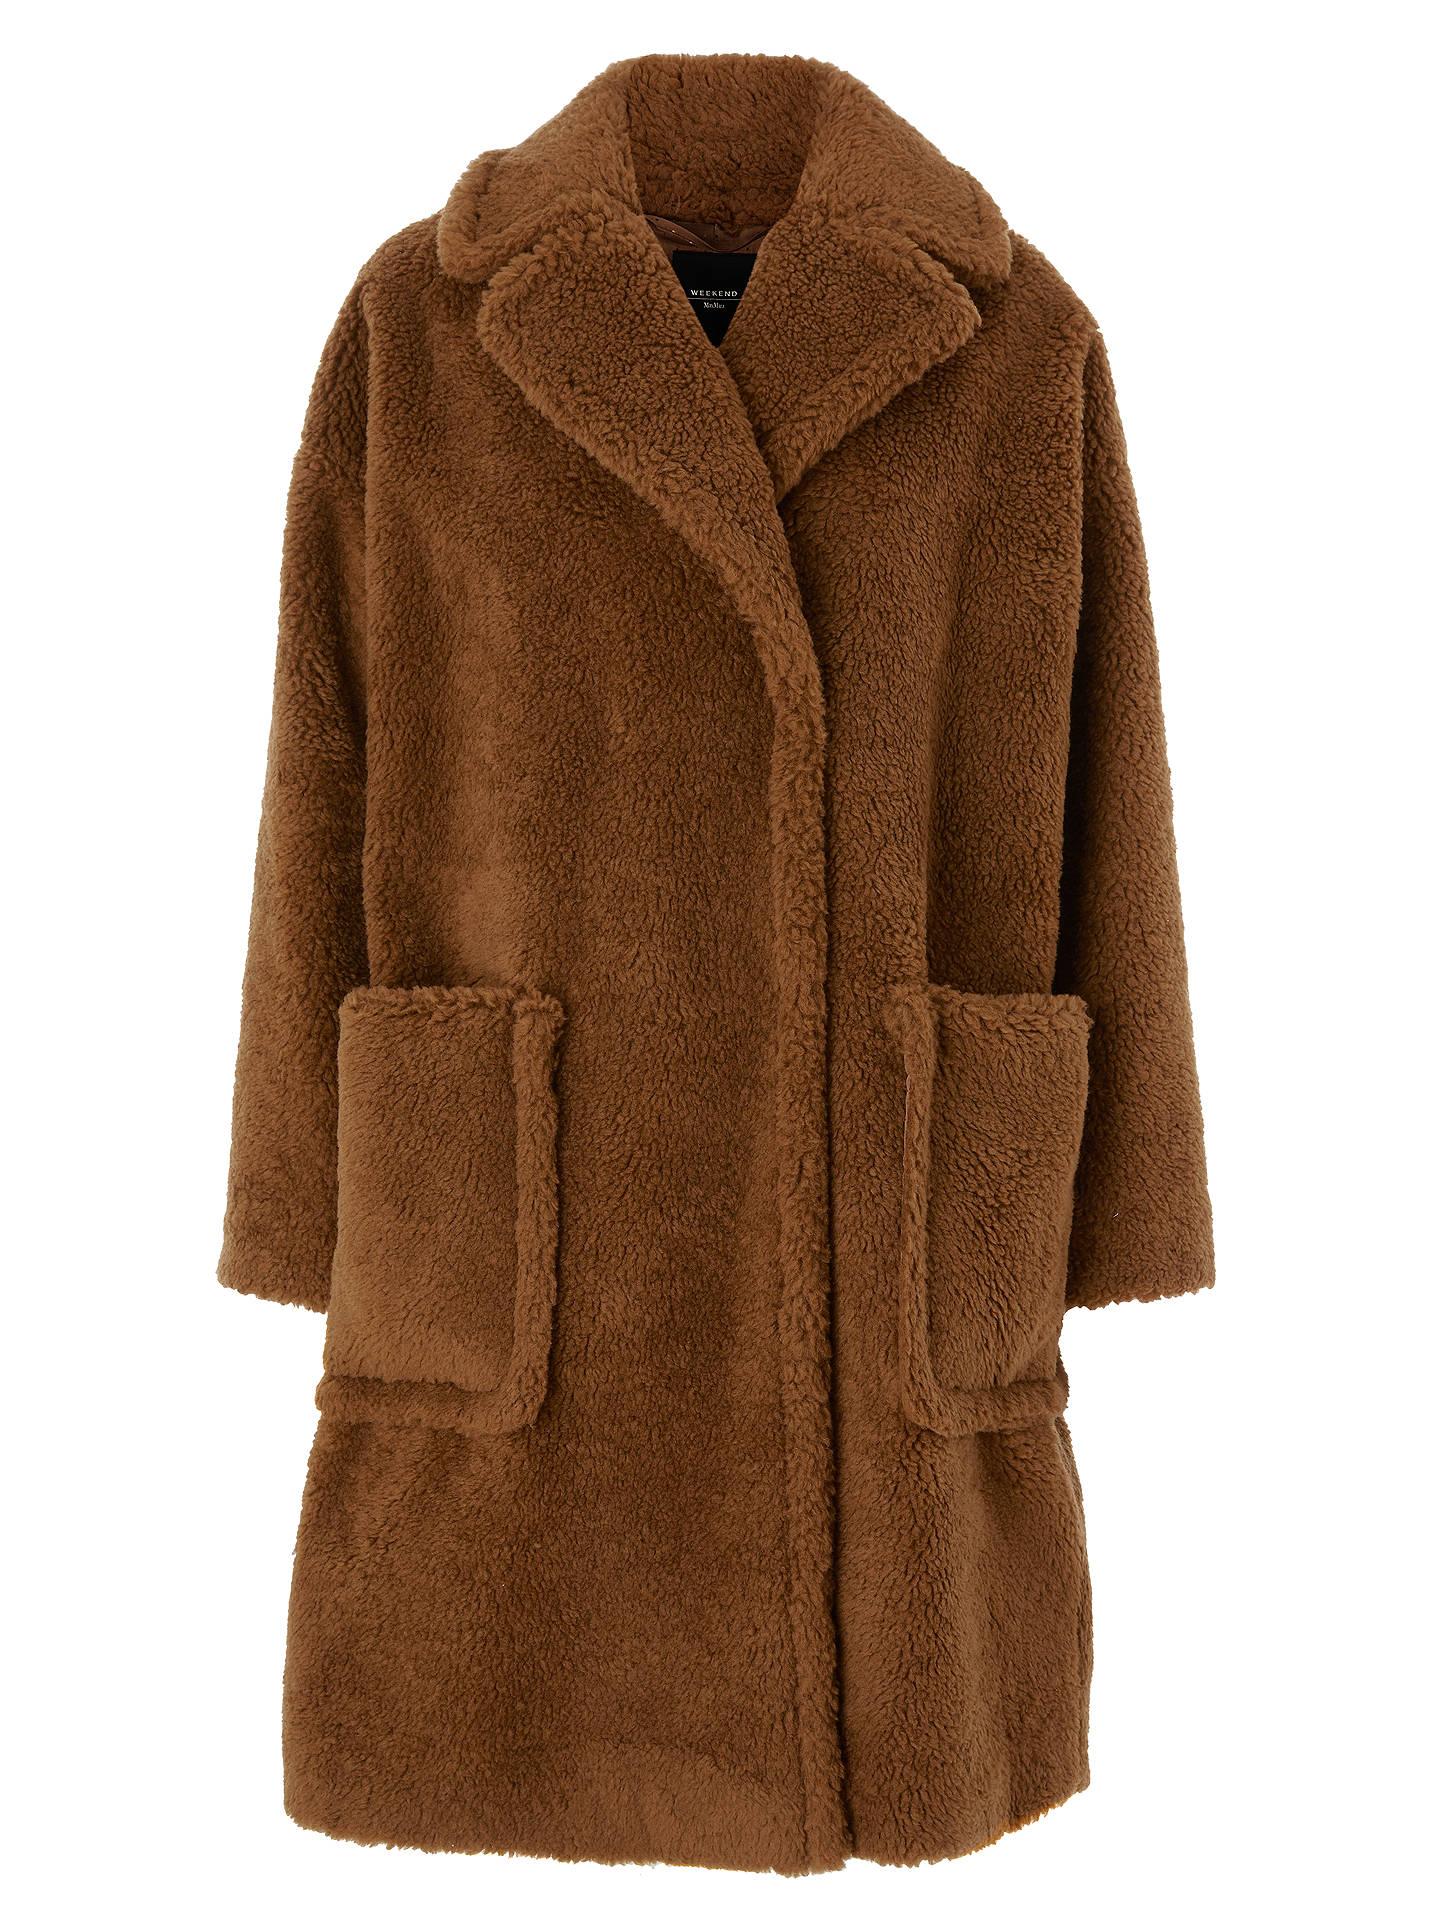 Weekend Faux Teddy Maxmara Fur Caramel Coat Reale John At Lewis rraxwSqgC